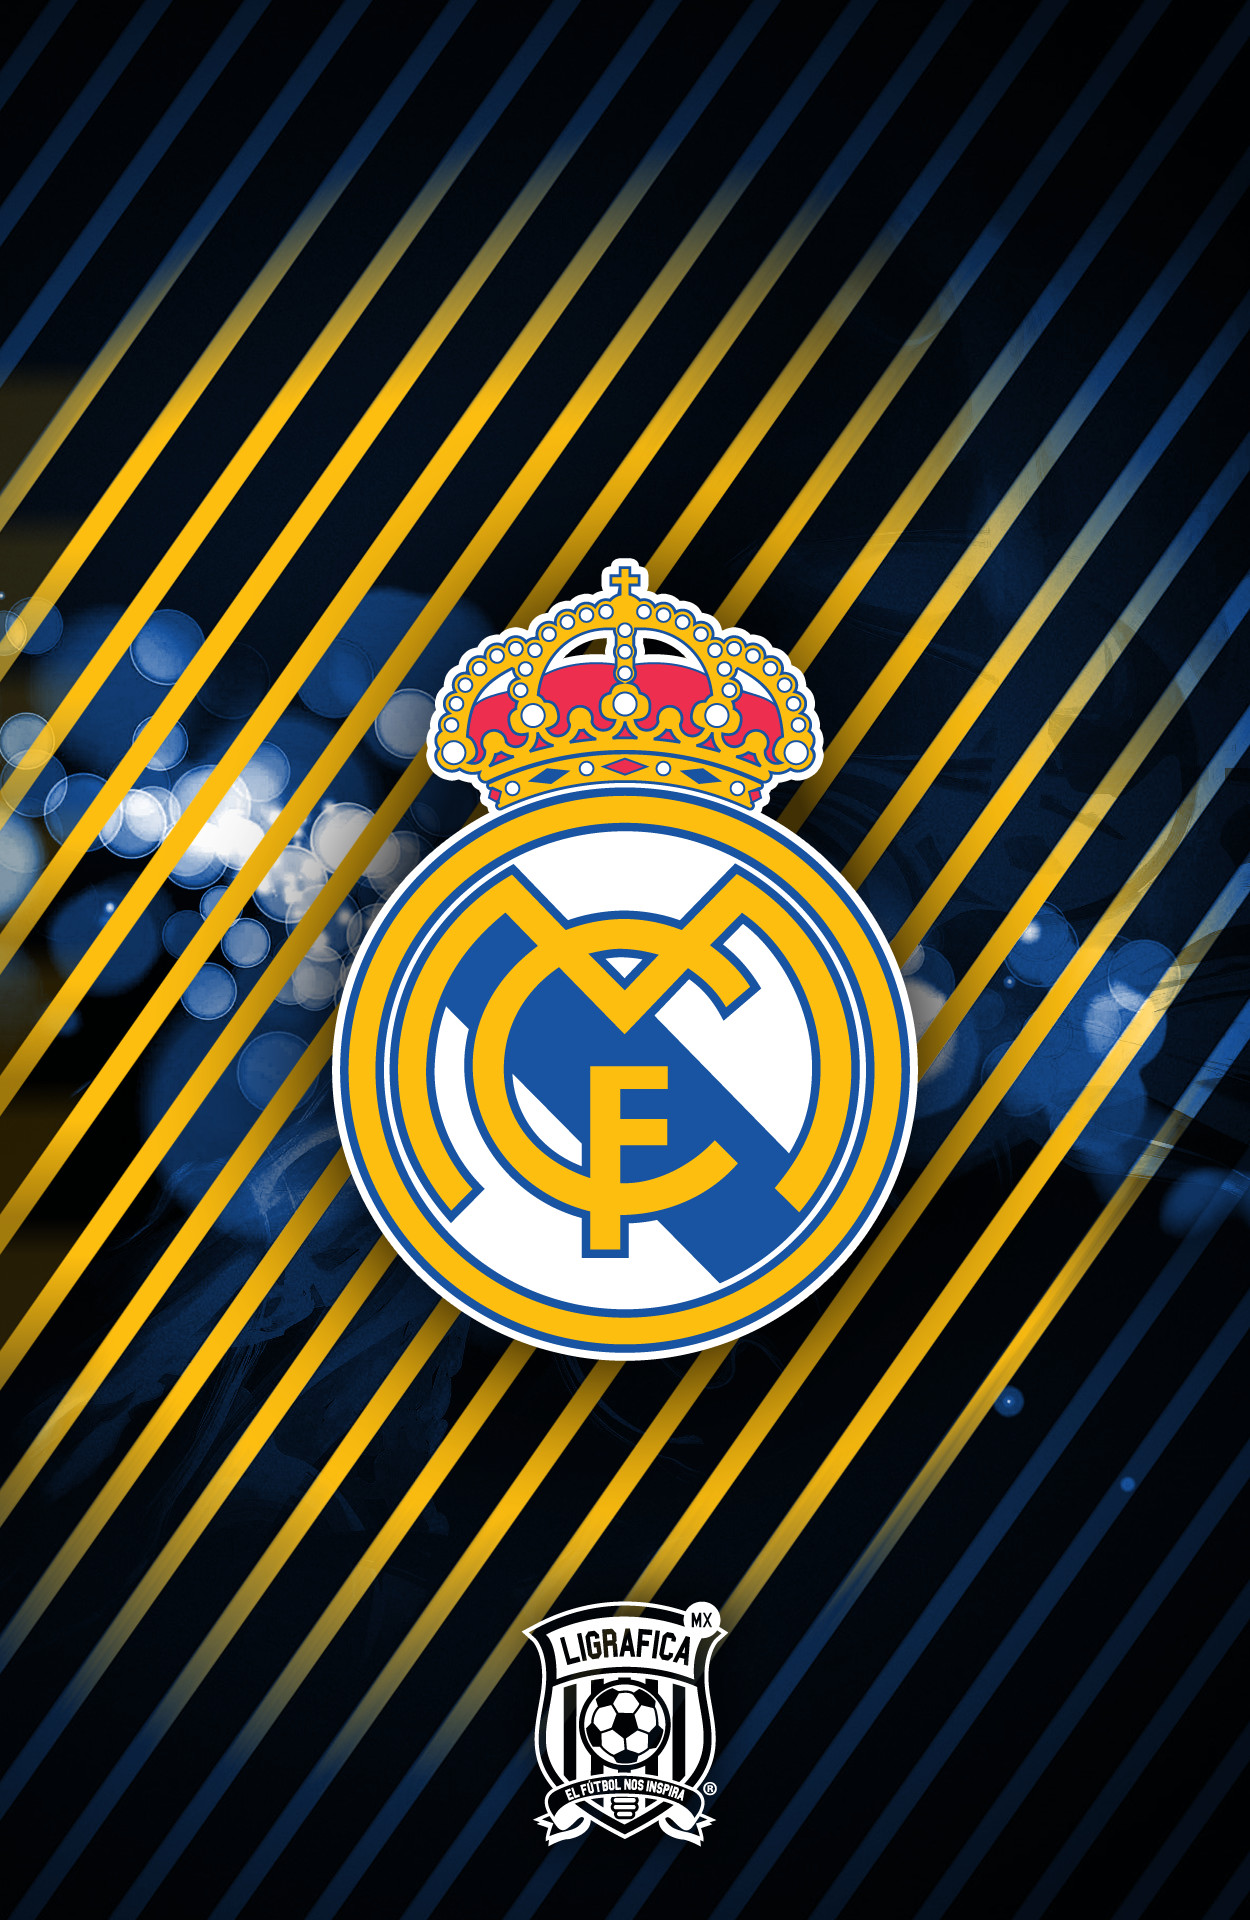 #LigraficaMX 14/04/15CTG · Real Madrid WallpapersCristiano …